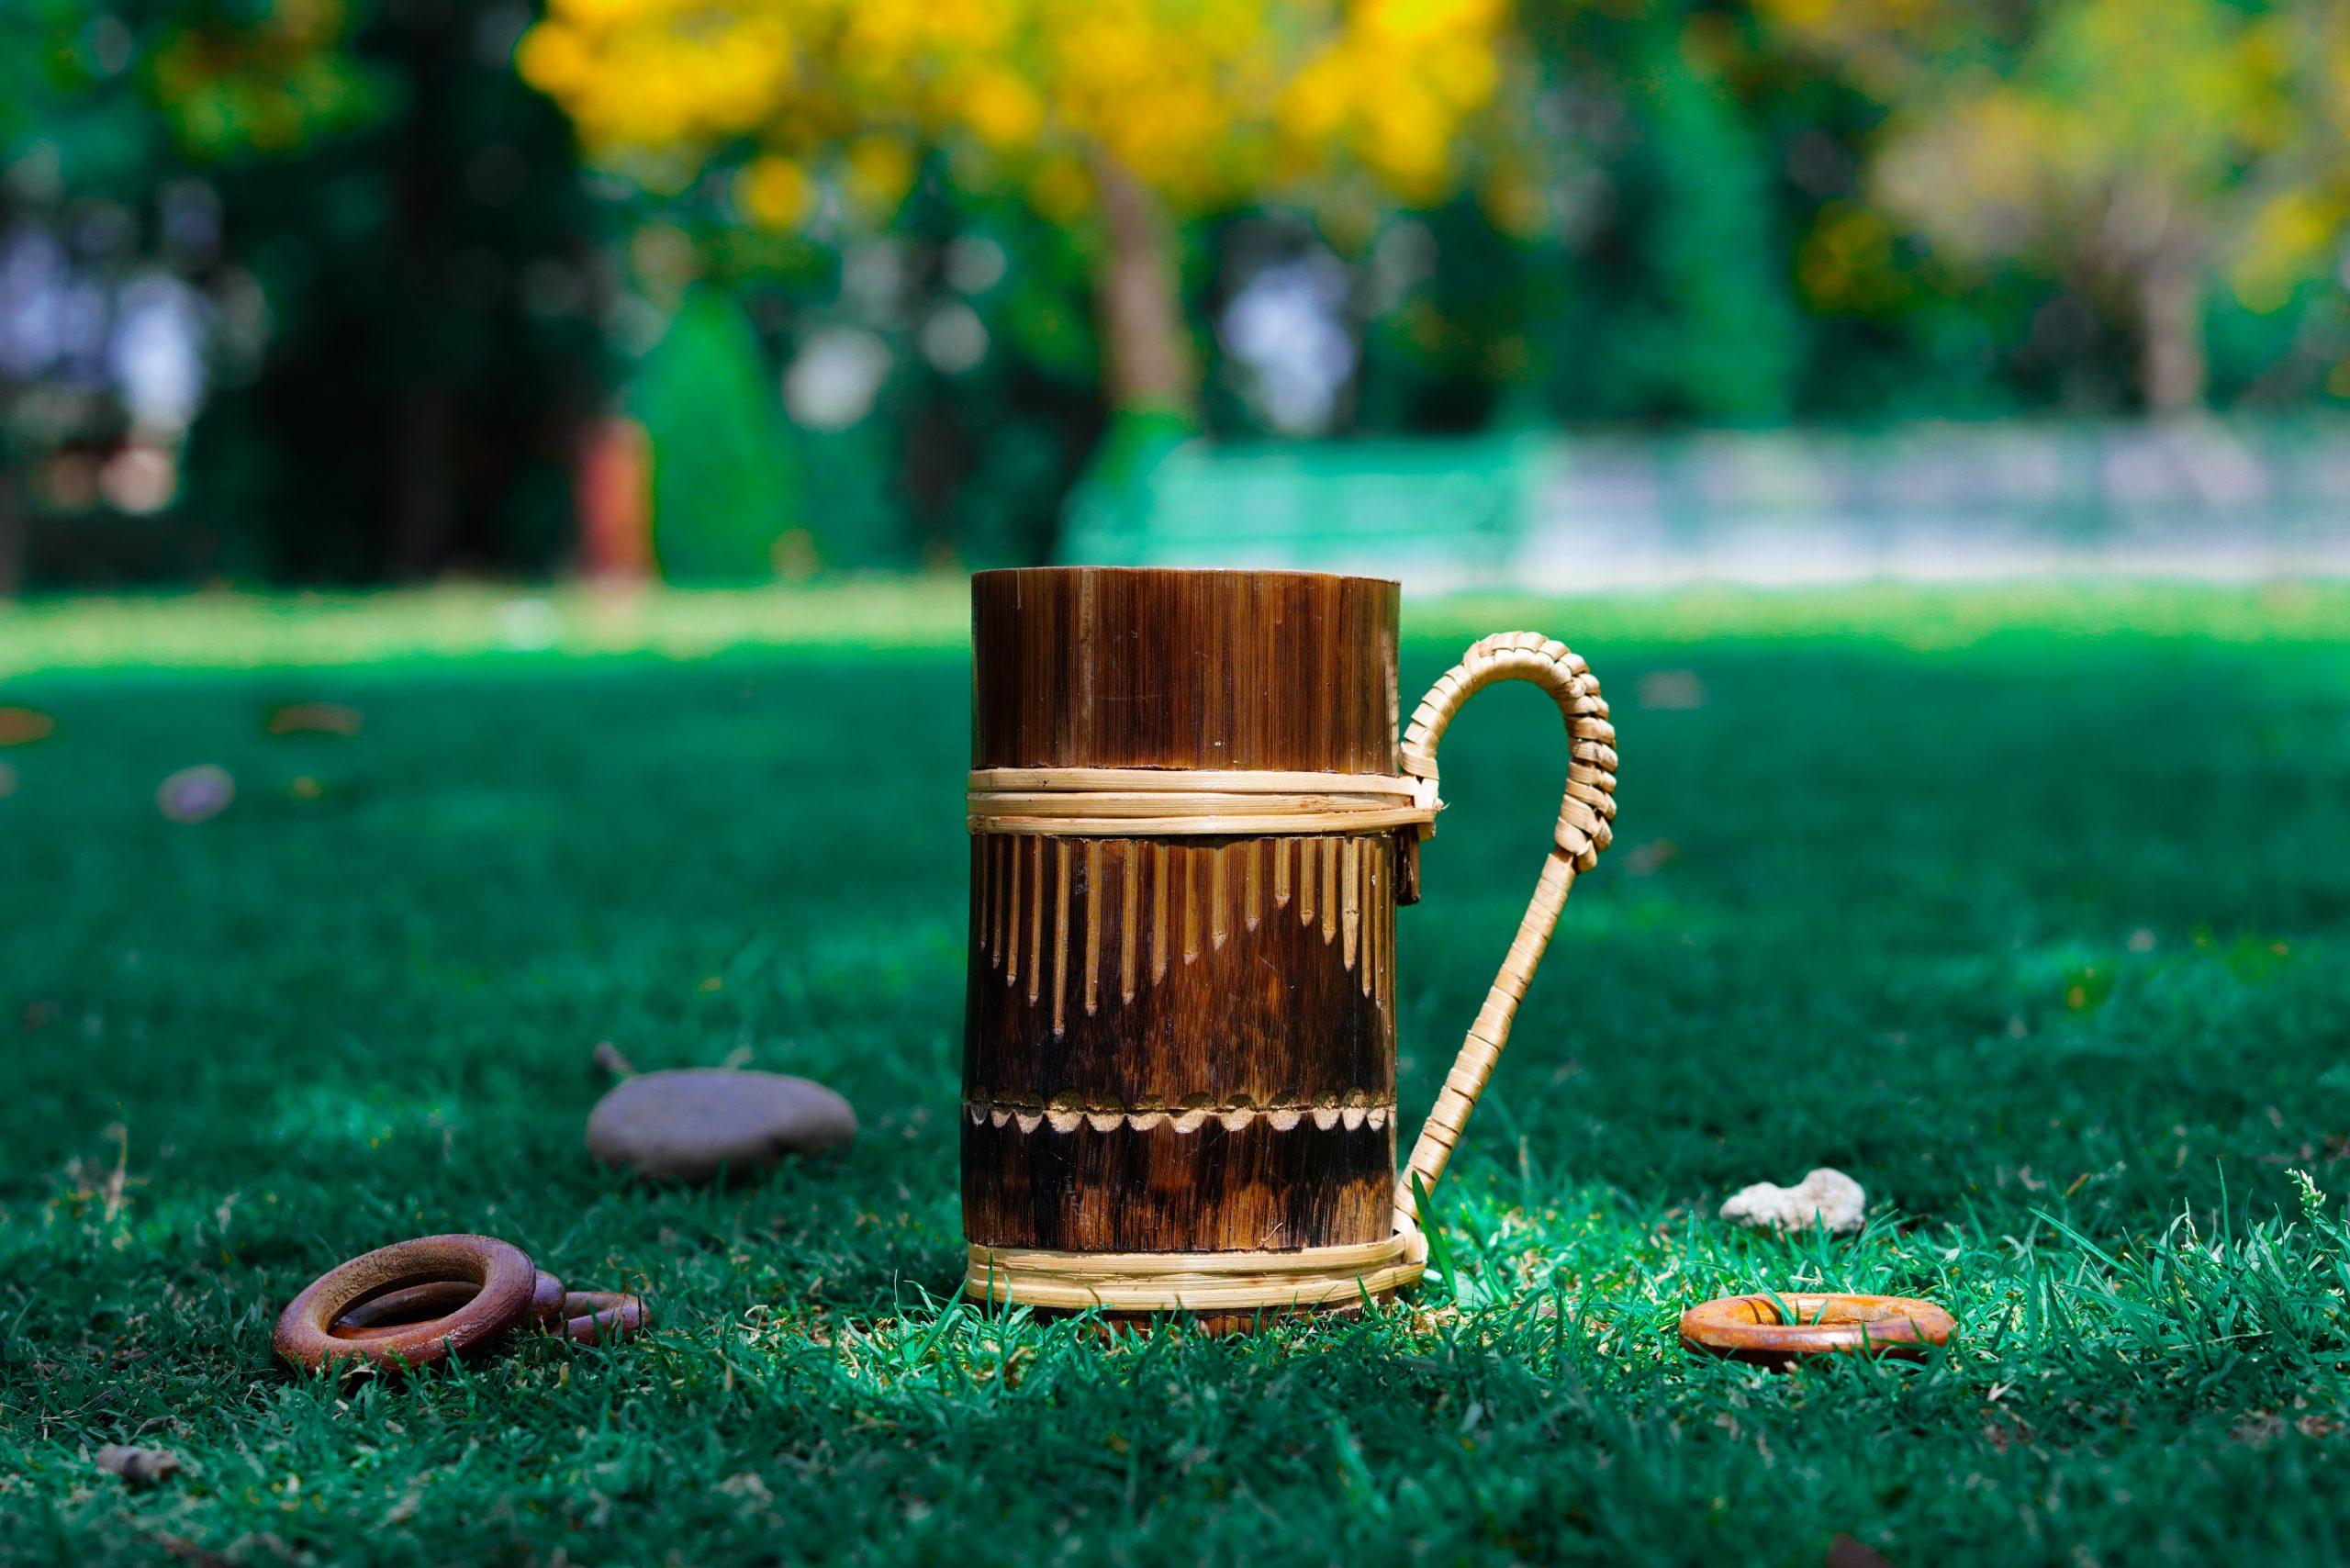 Wooden mug in the garden